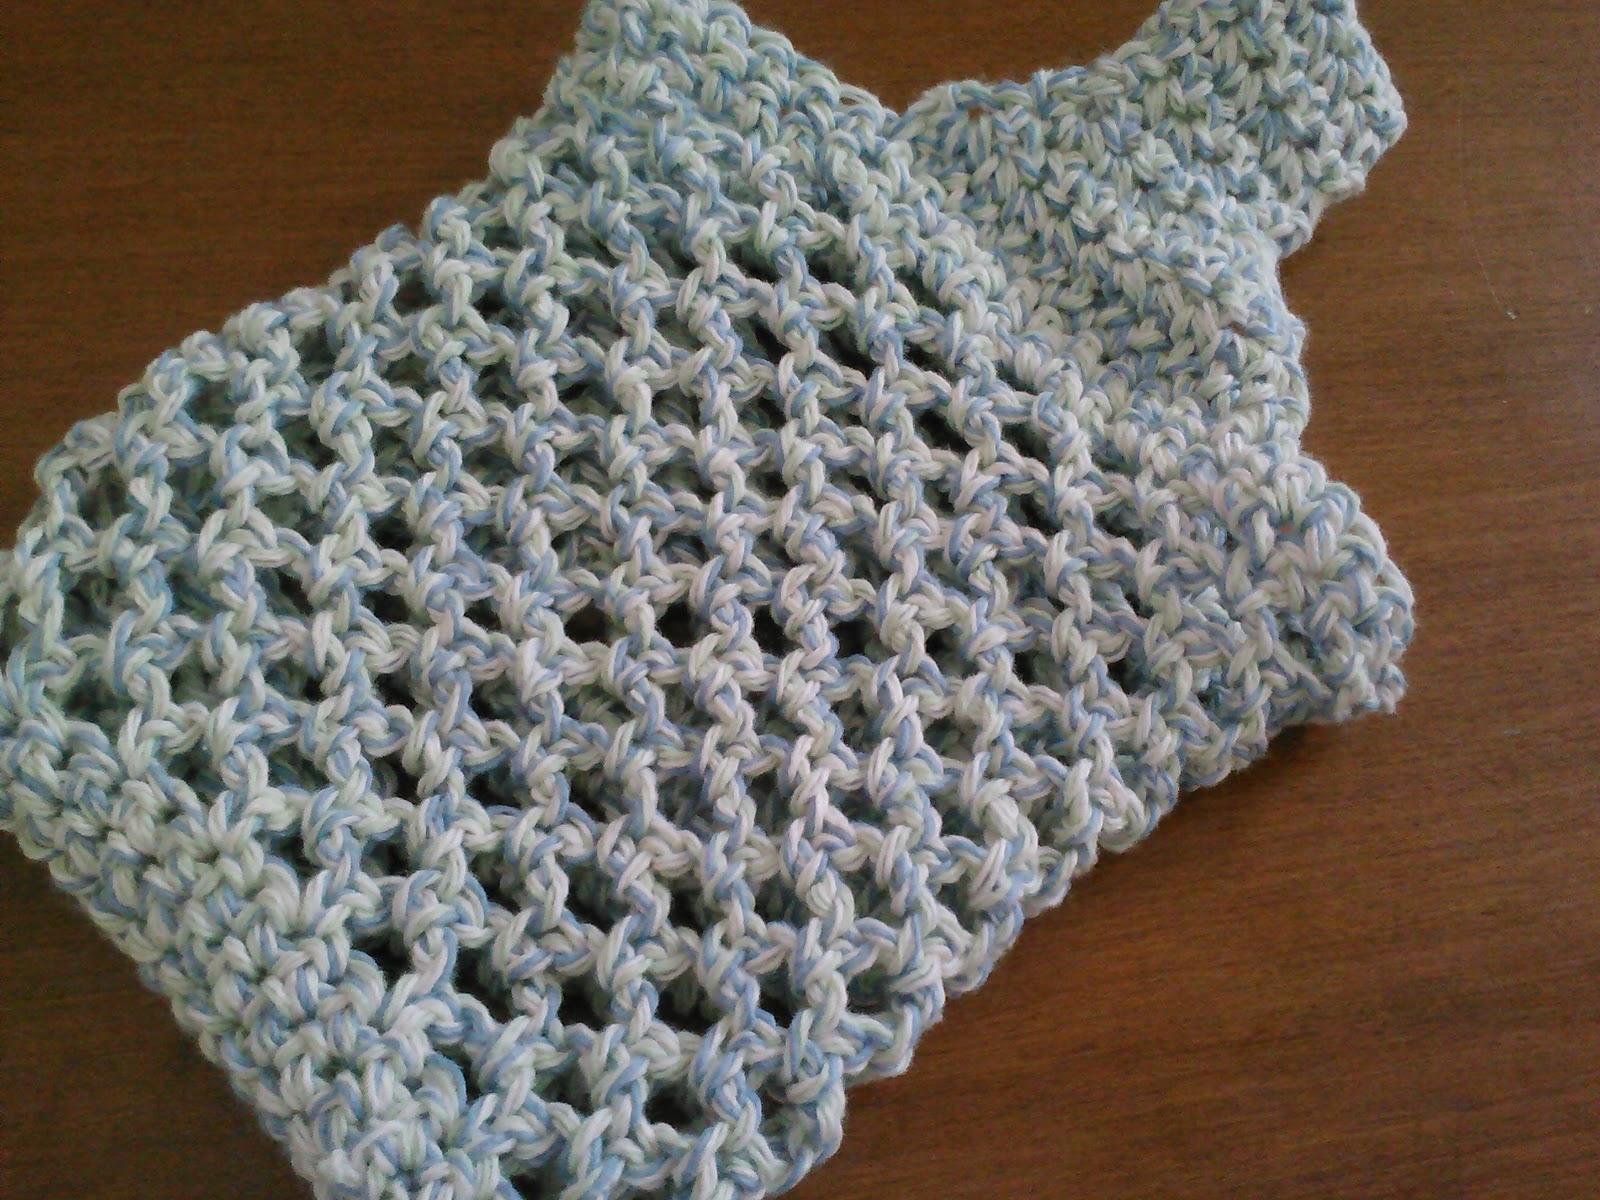 Crochet Vegetable Bag Pattern : Yum, Yarn and Yoga: Crochet Produce Bag